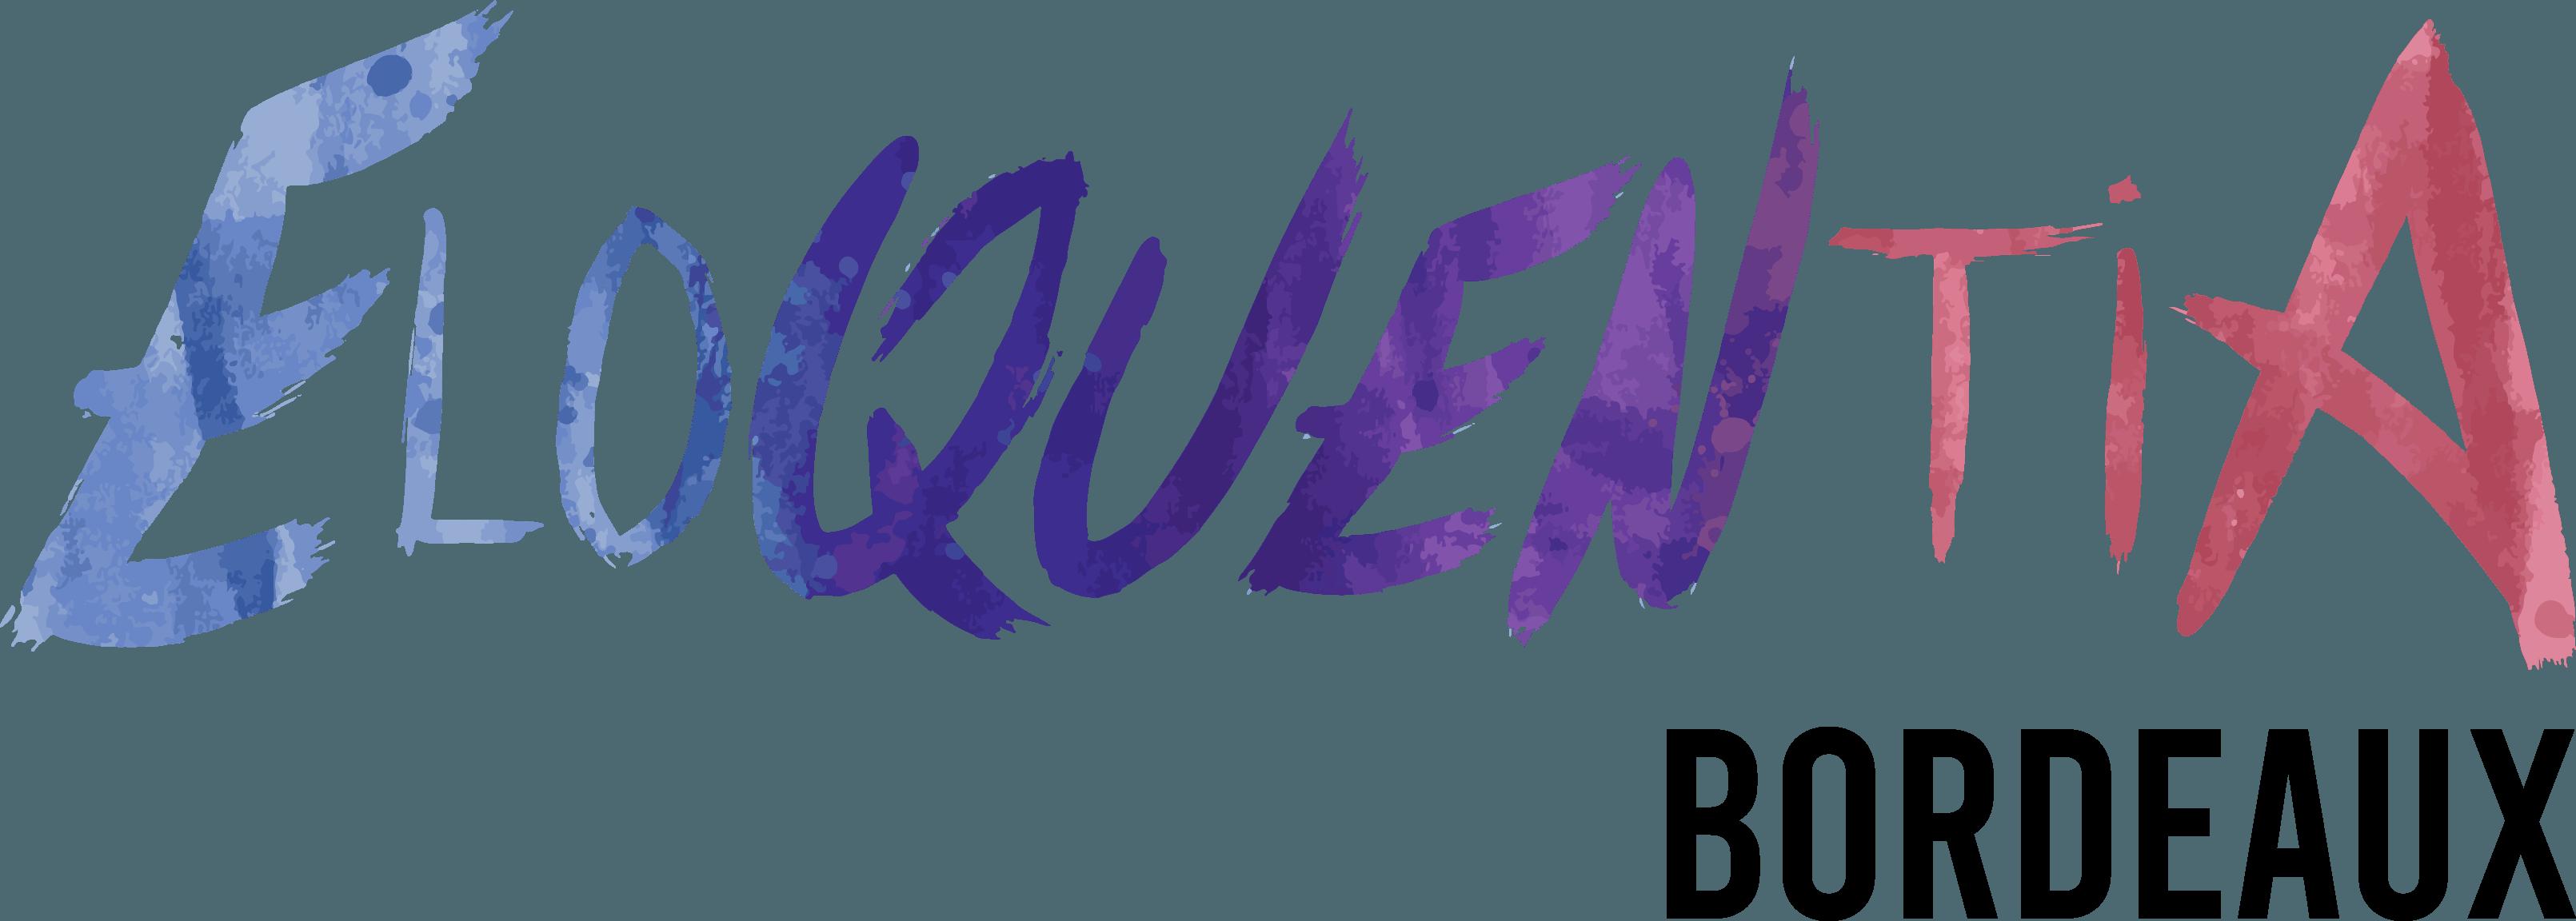 Eloquentia Bordeaux